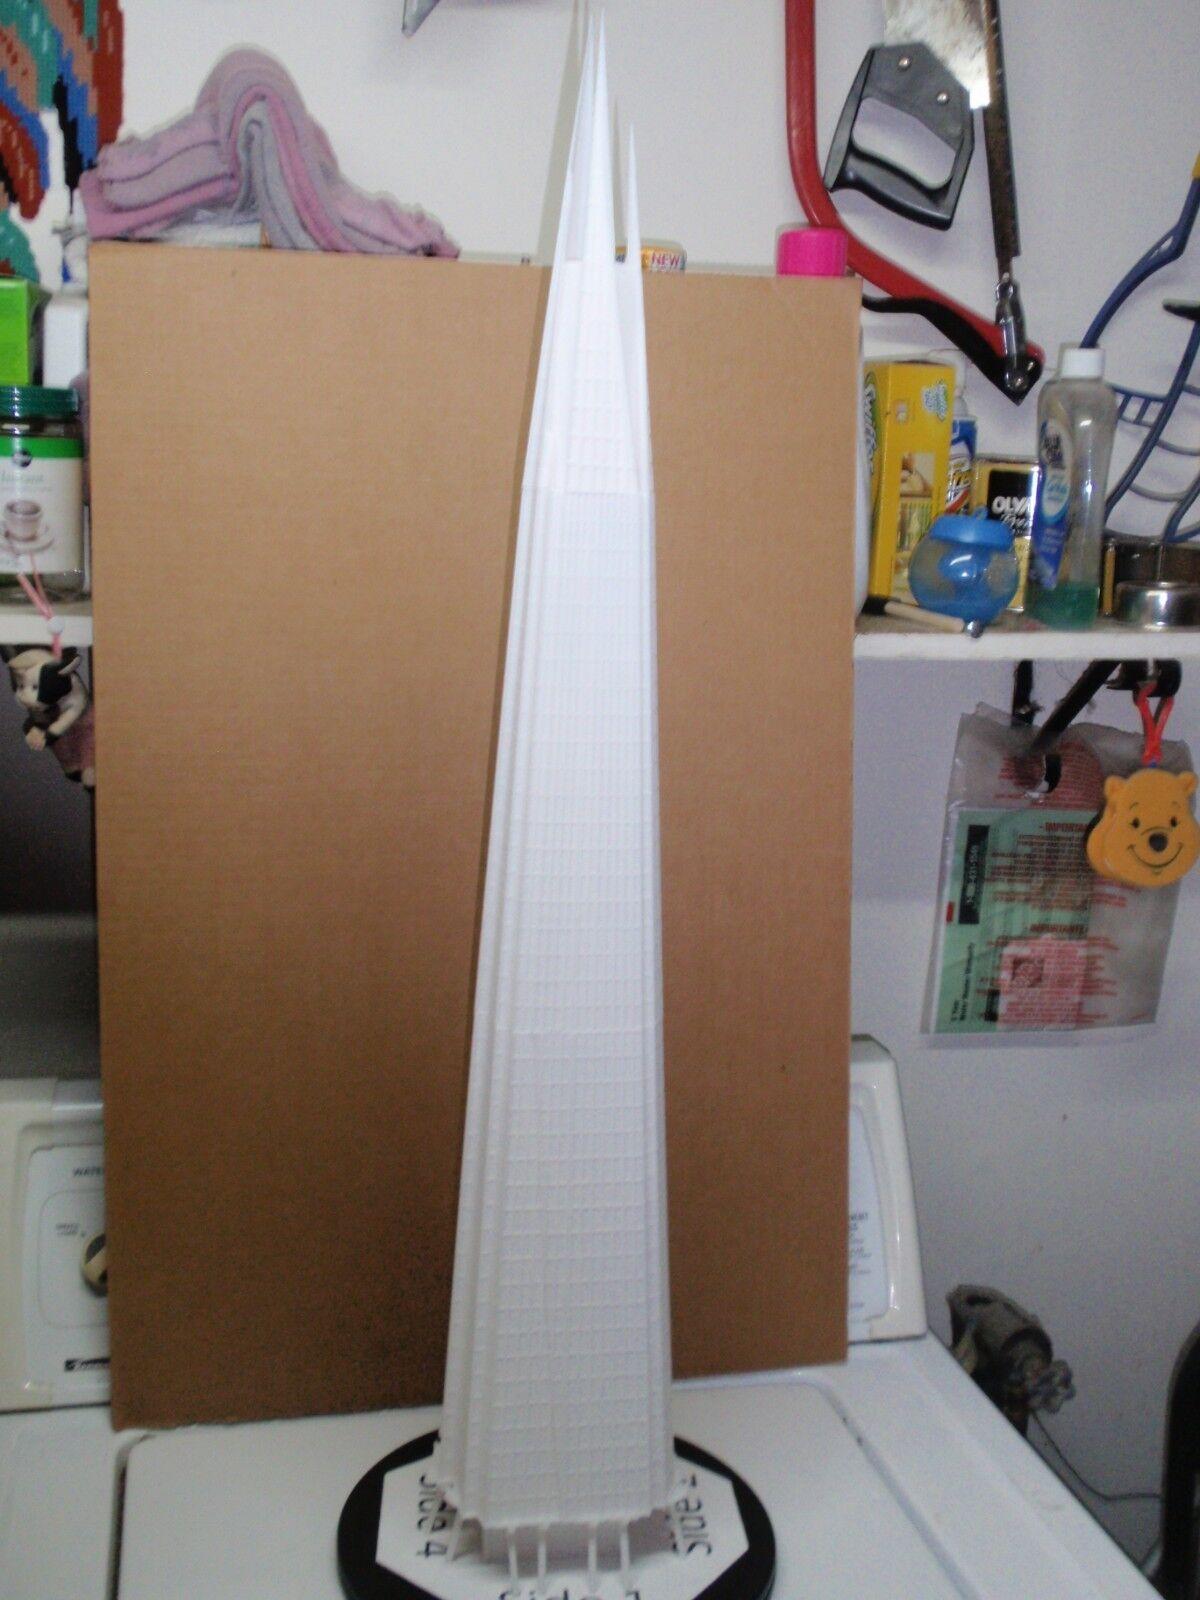 MASSIVE Z SCALE BUILDING BASED OFF THE SHARD IN LONDON SKY SCRAPER \ OFFICE